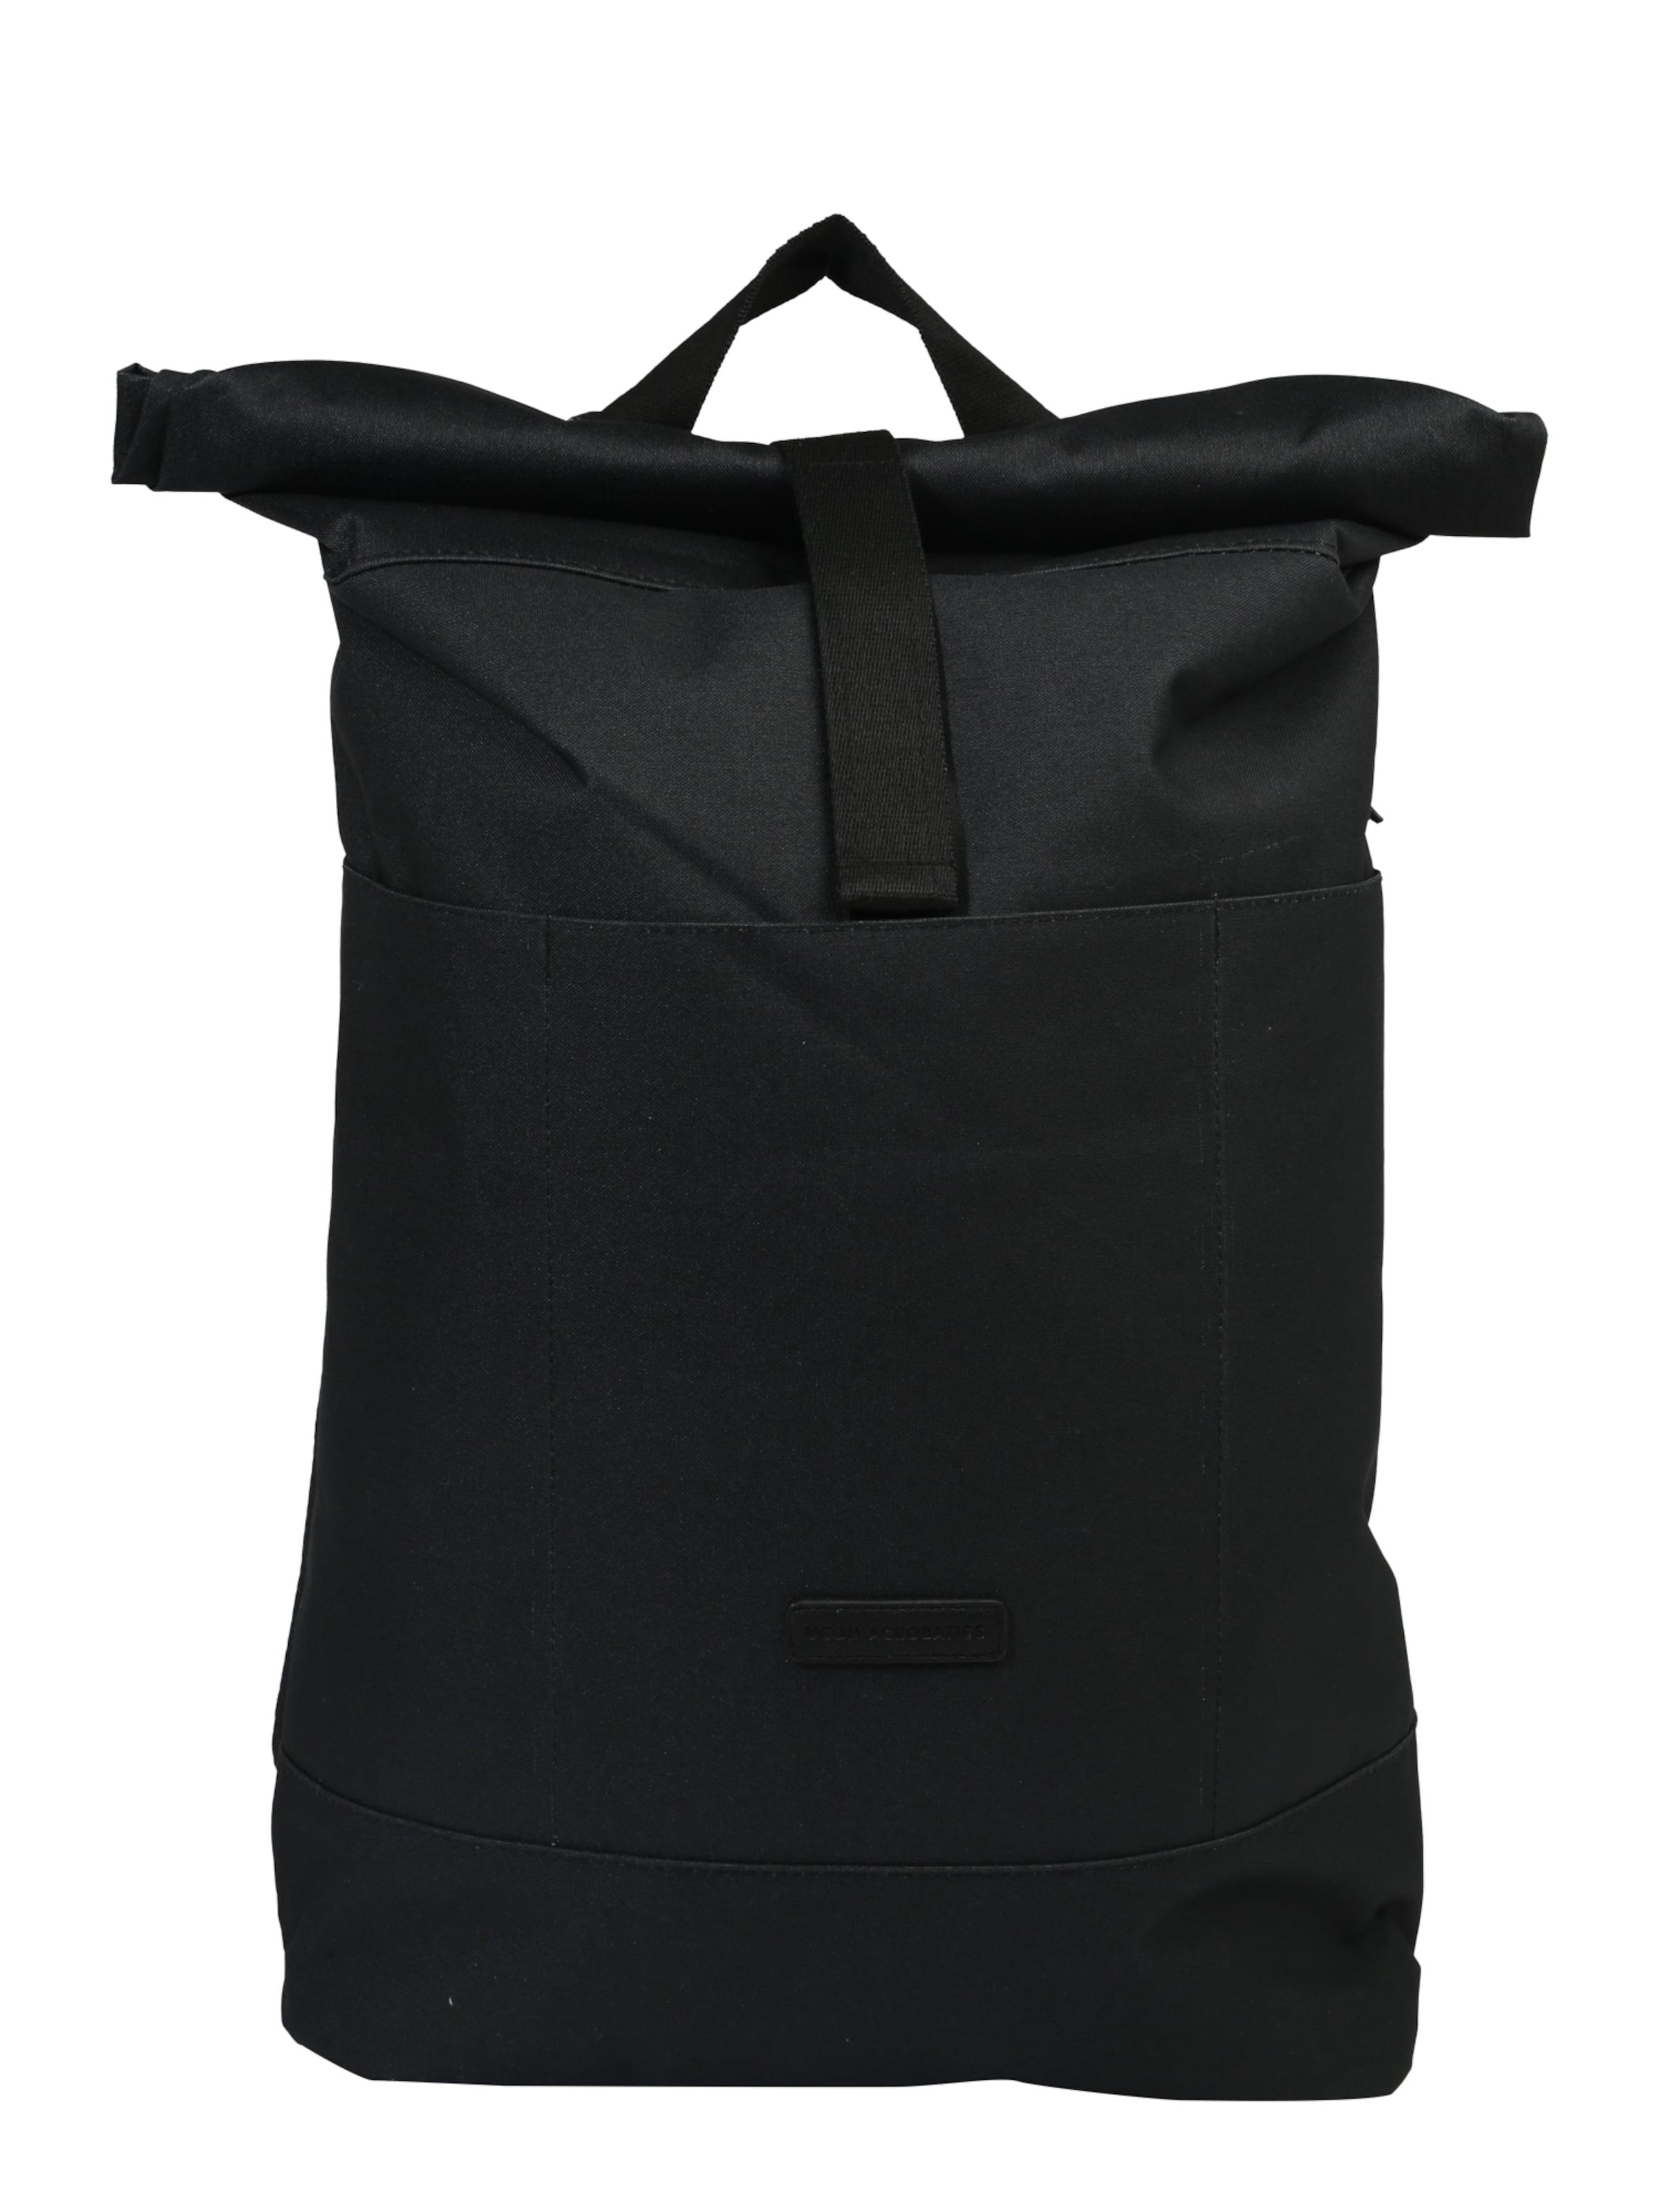 À En Noir Ucon Backpack' Sac Acrobatics Dos 'hajo 35RAj4L